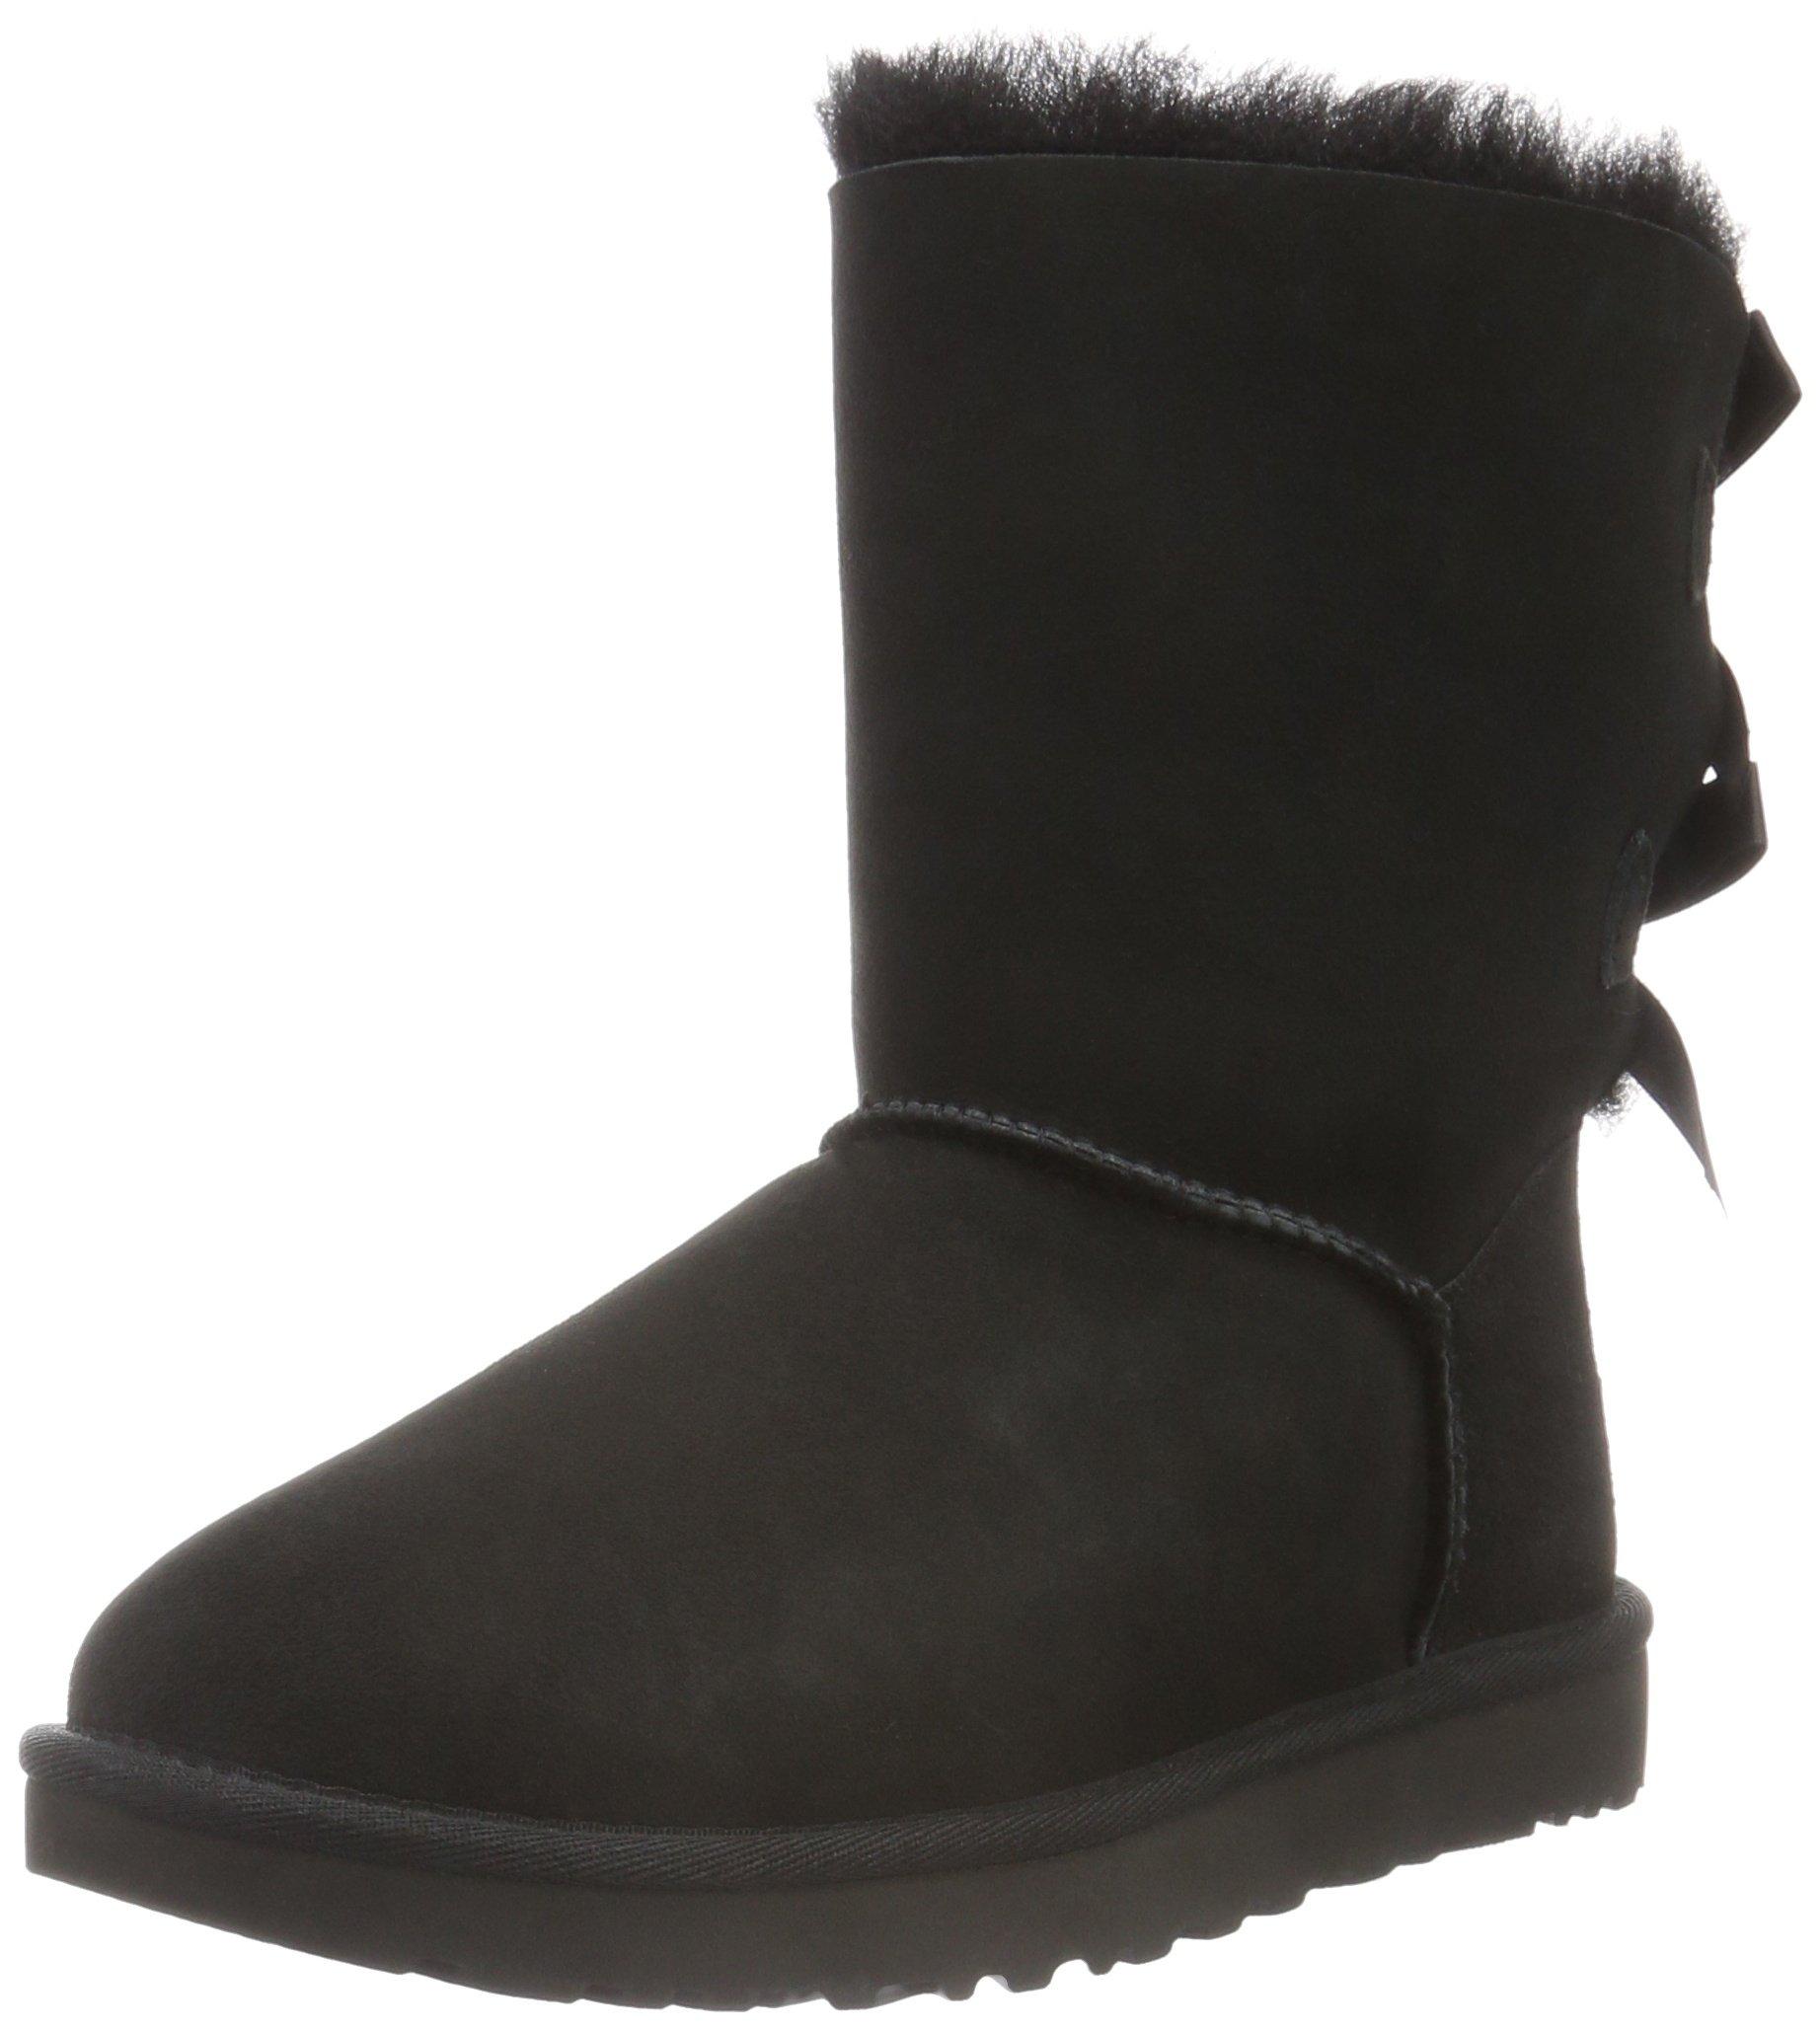 UGG Women's Bailey Bow II Winter Boot, Black, 9 B US